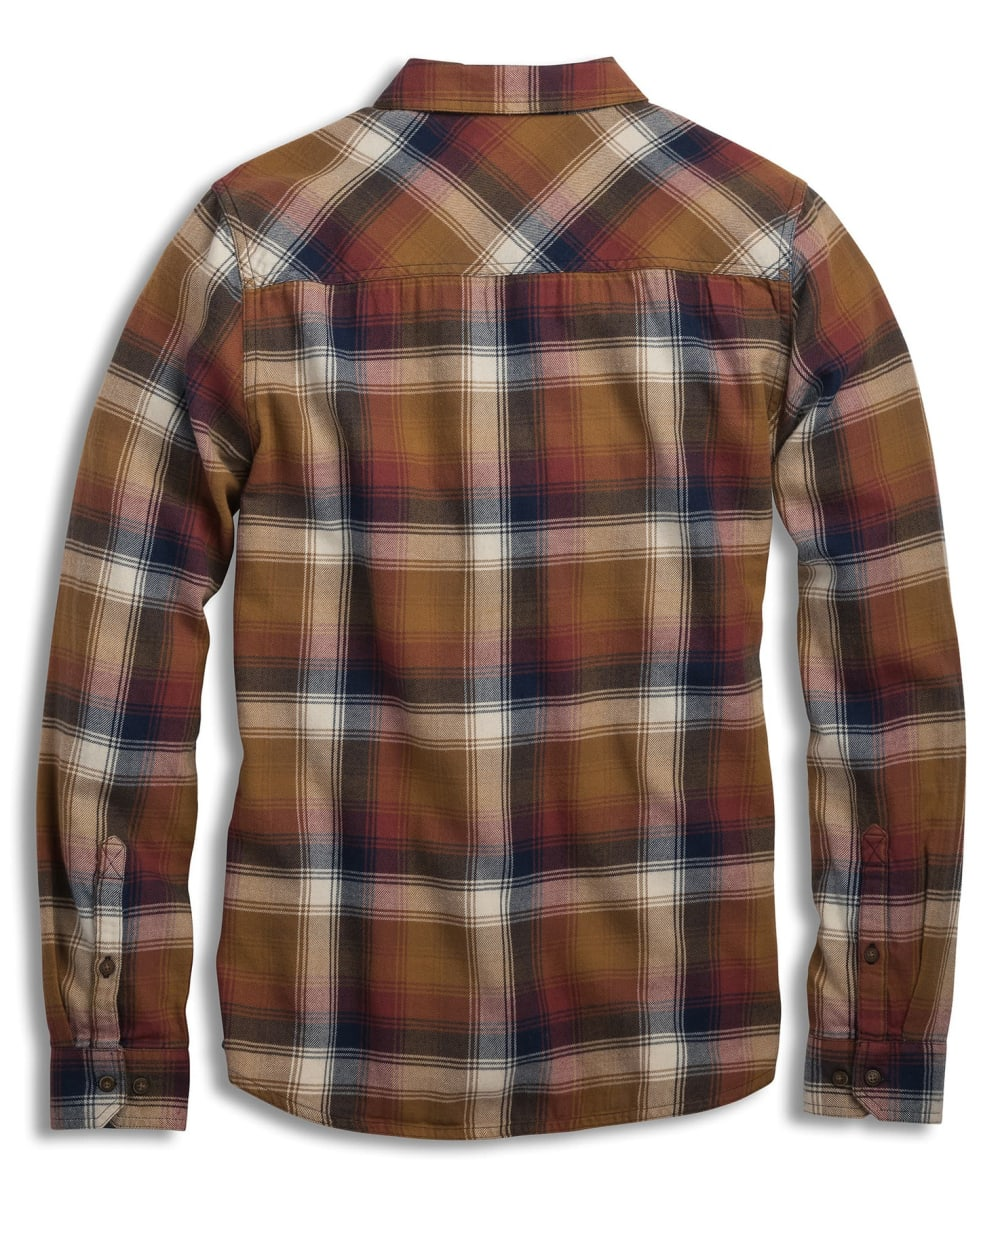 TOAD & CO. Men's Indigo Flannel Slim Long-Sleeve Shirt - DIJON-246